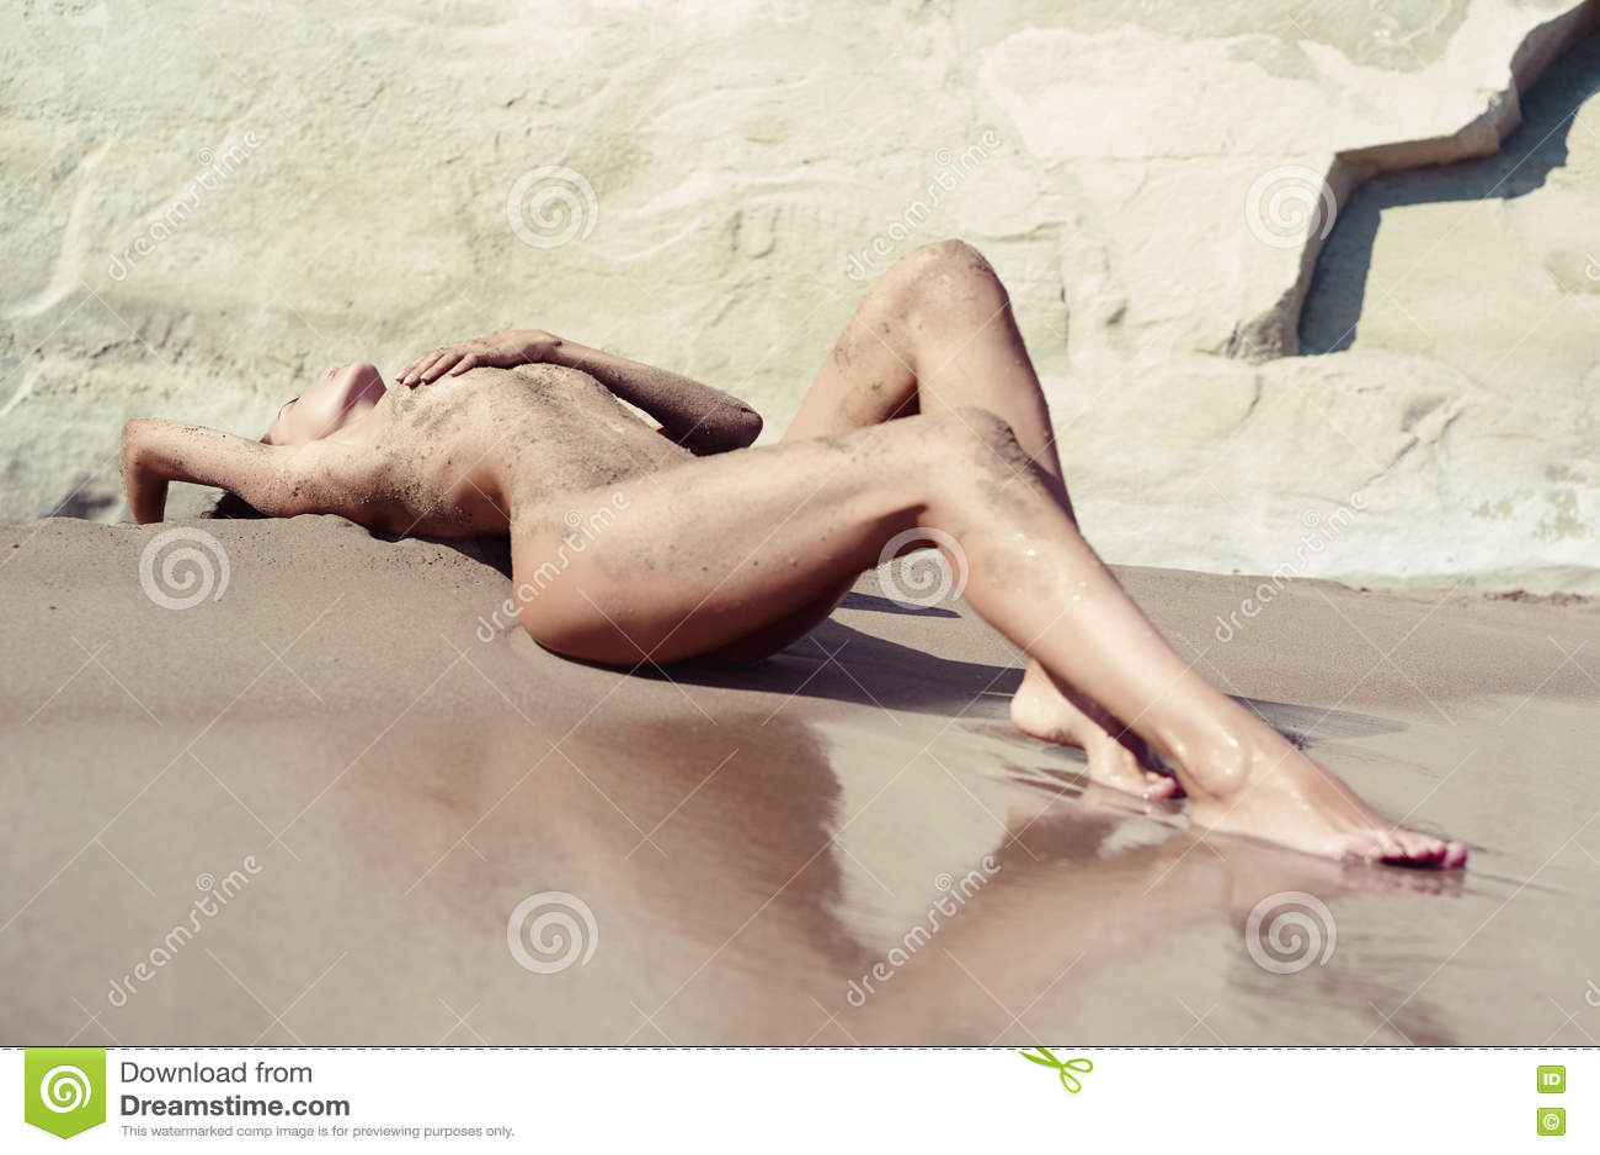 Hairy everywhere nude girls